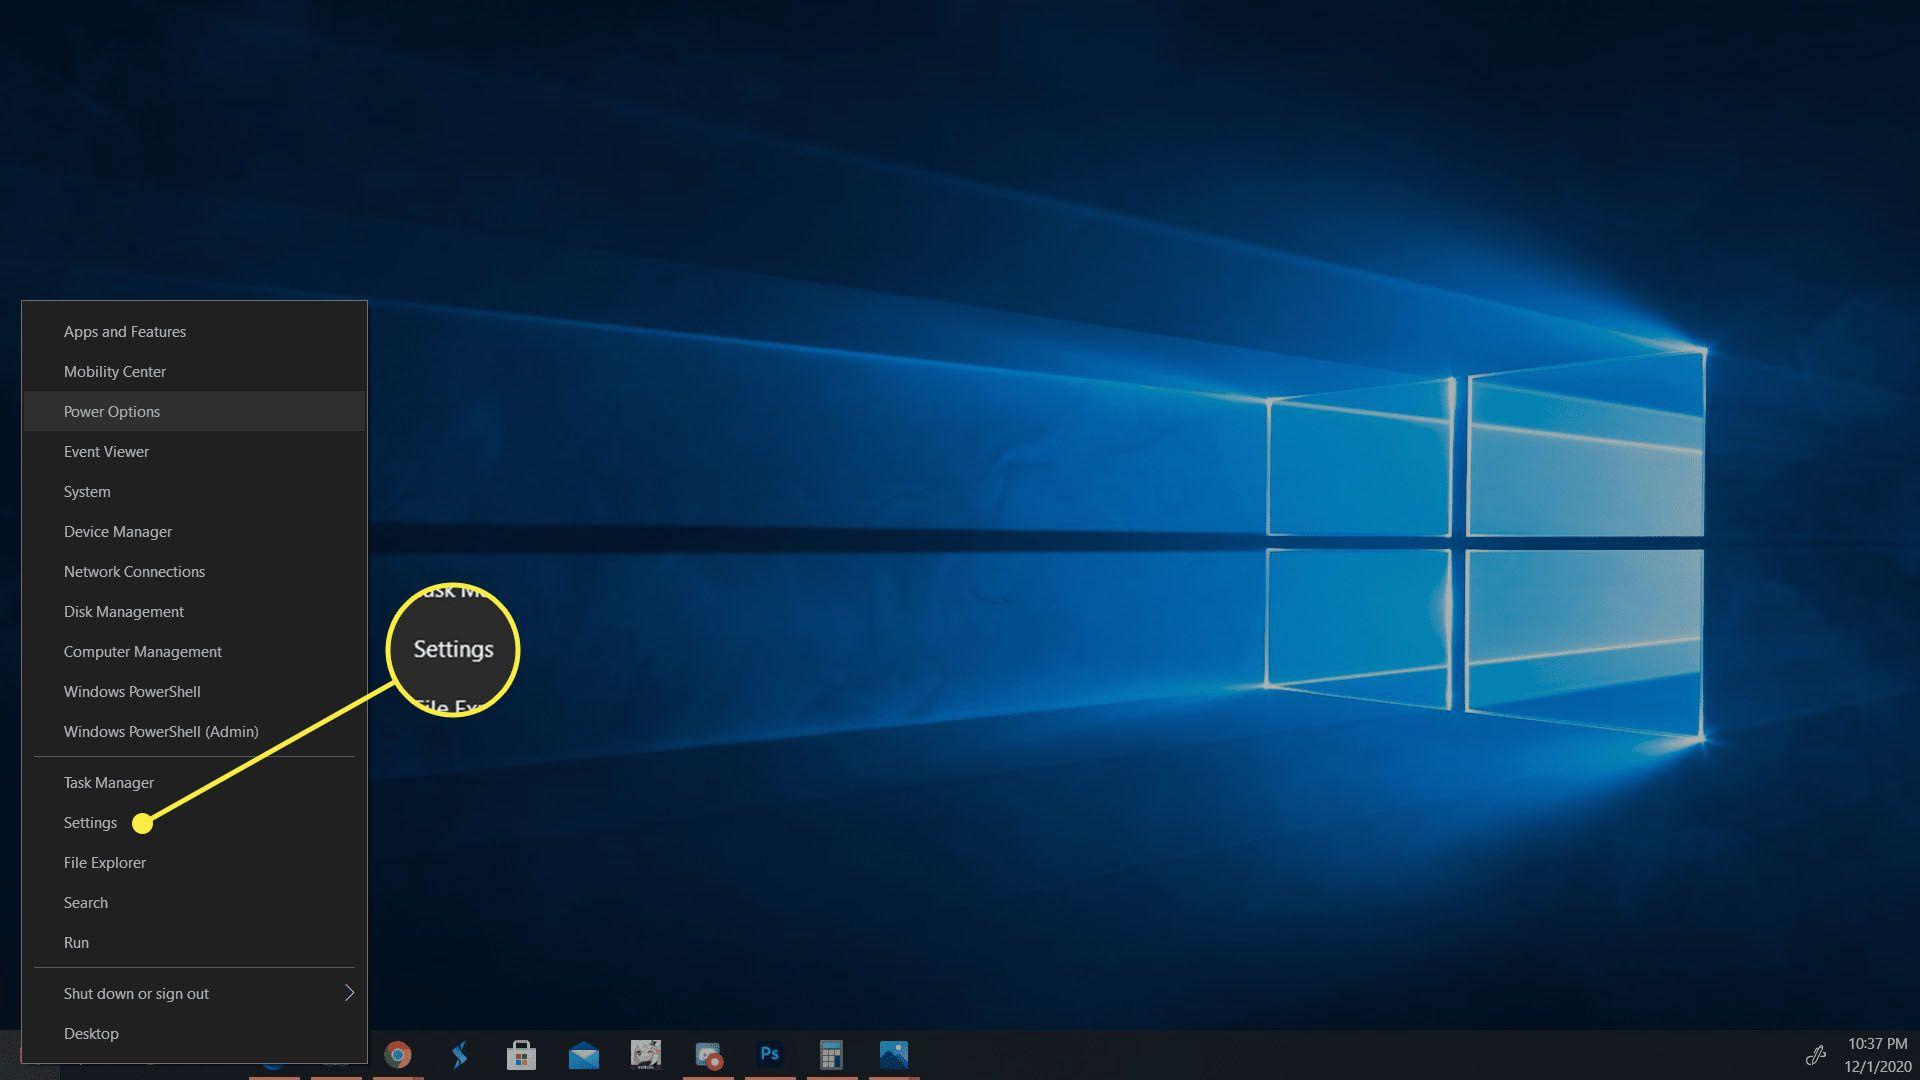 The Settings option in the Windows 10 Start menu.